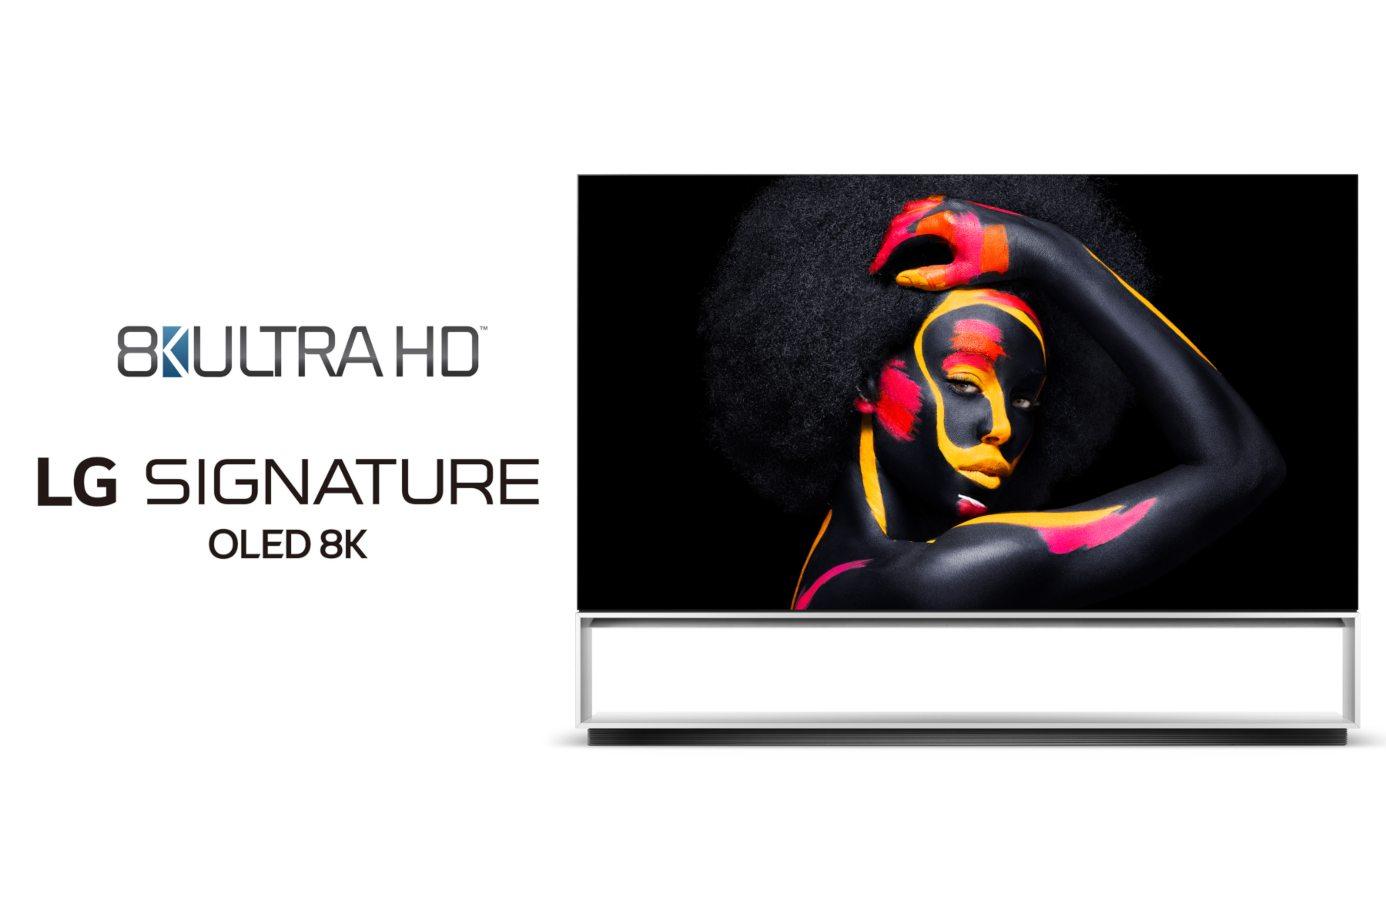 LG INAUGURA LA ERA DEL 8K ULTRA HD